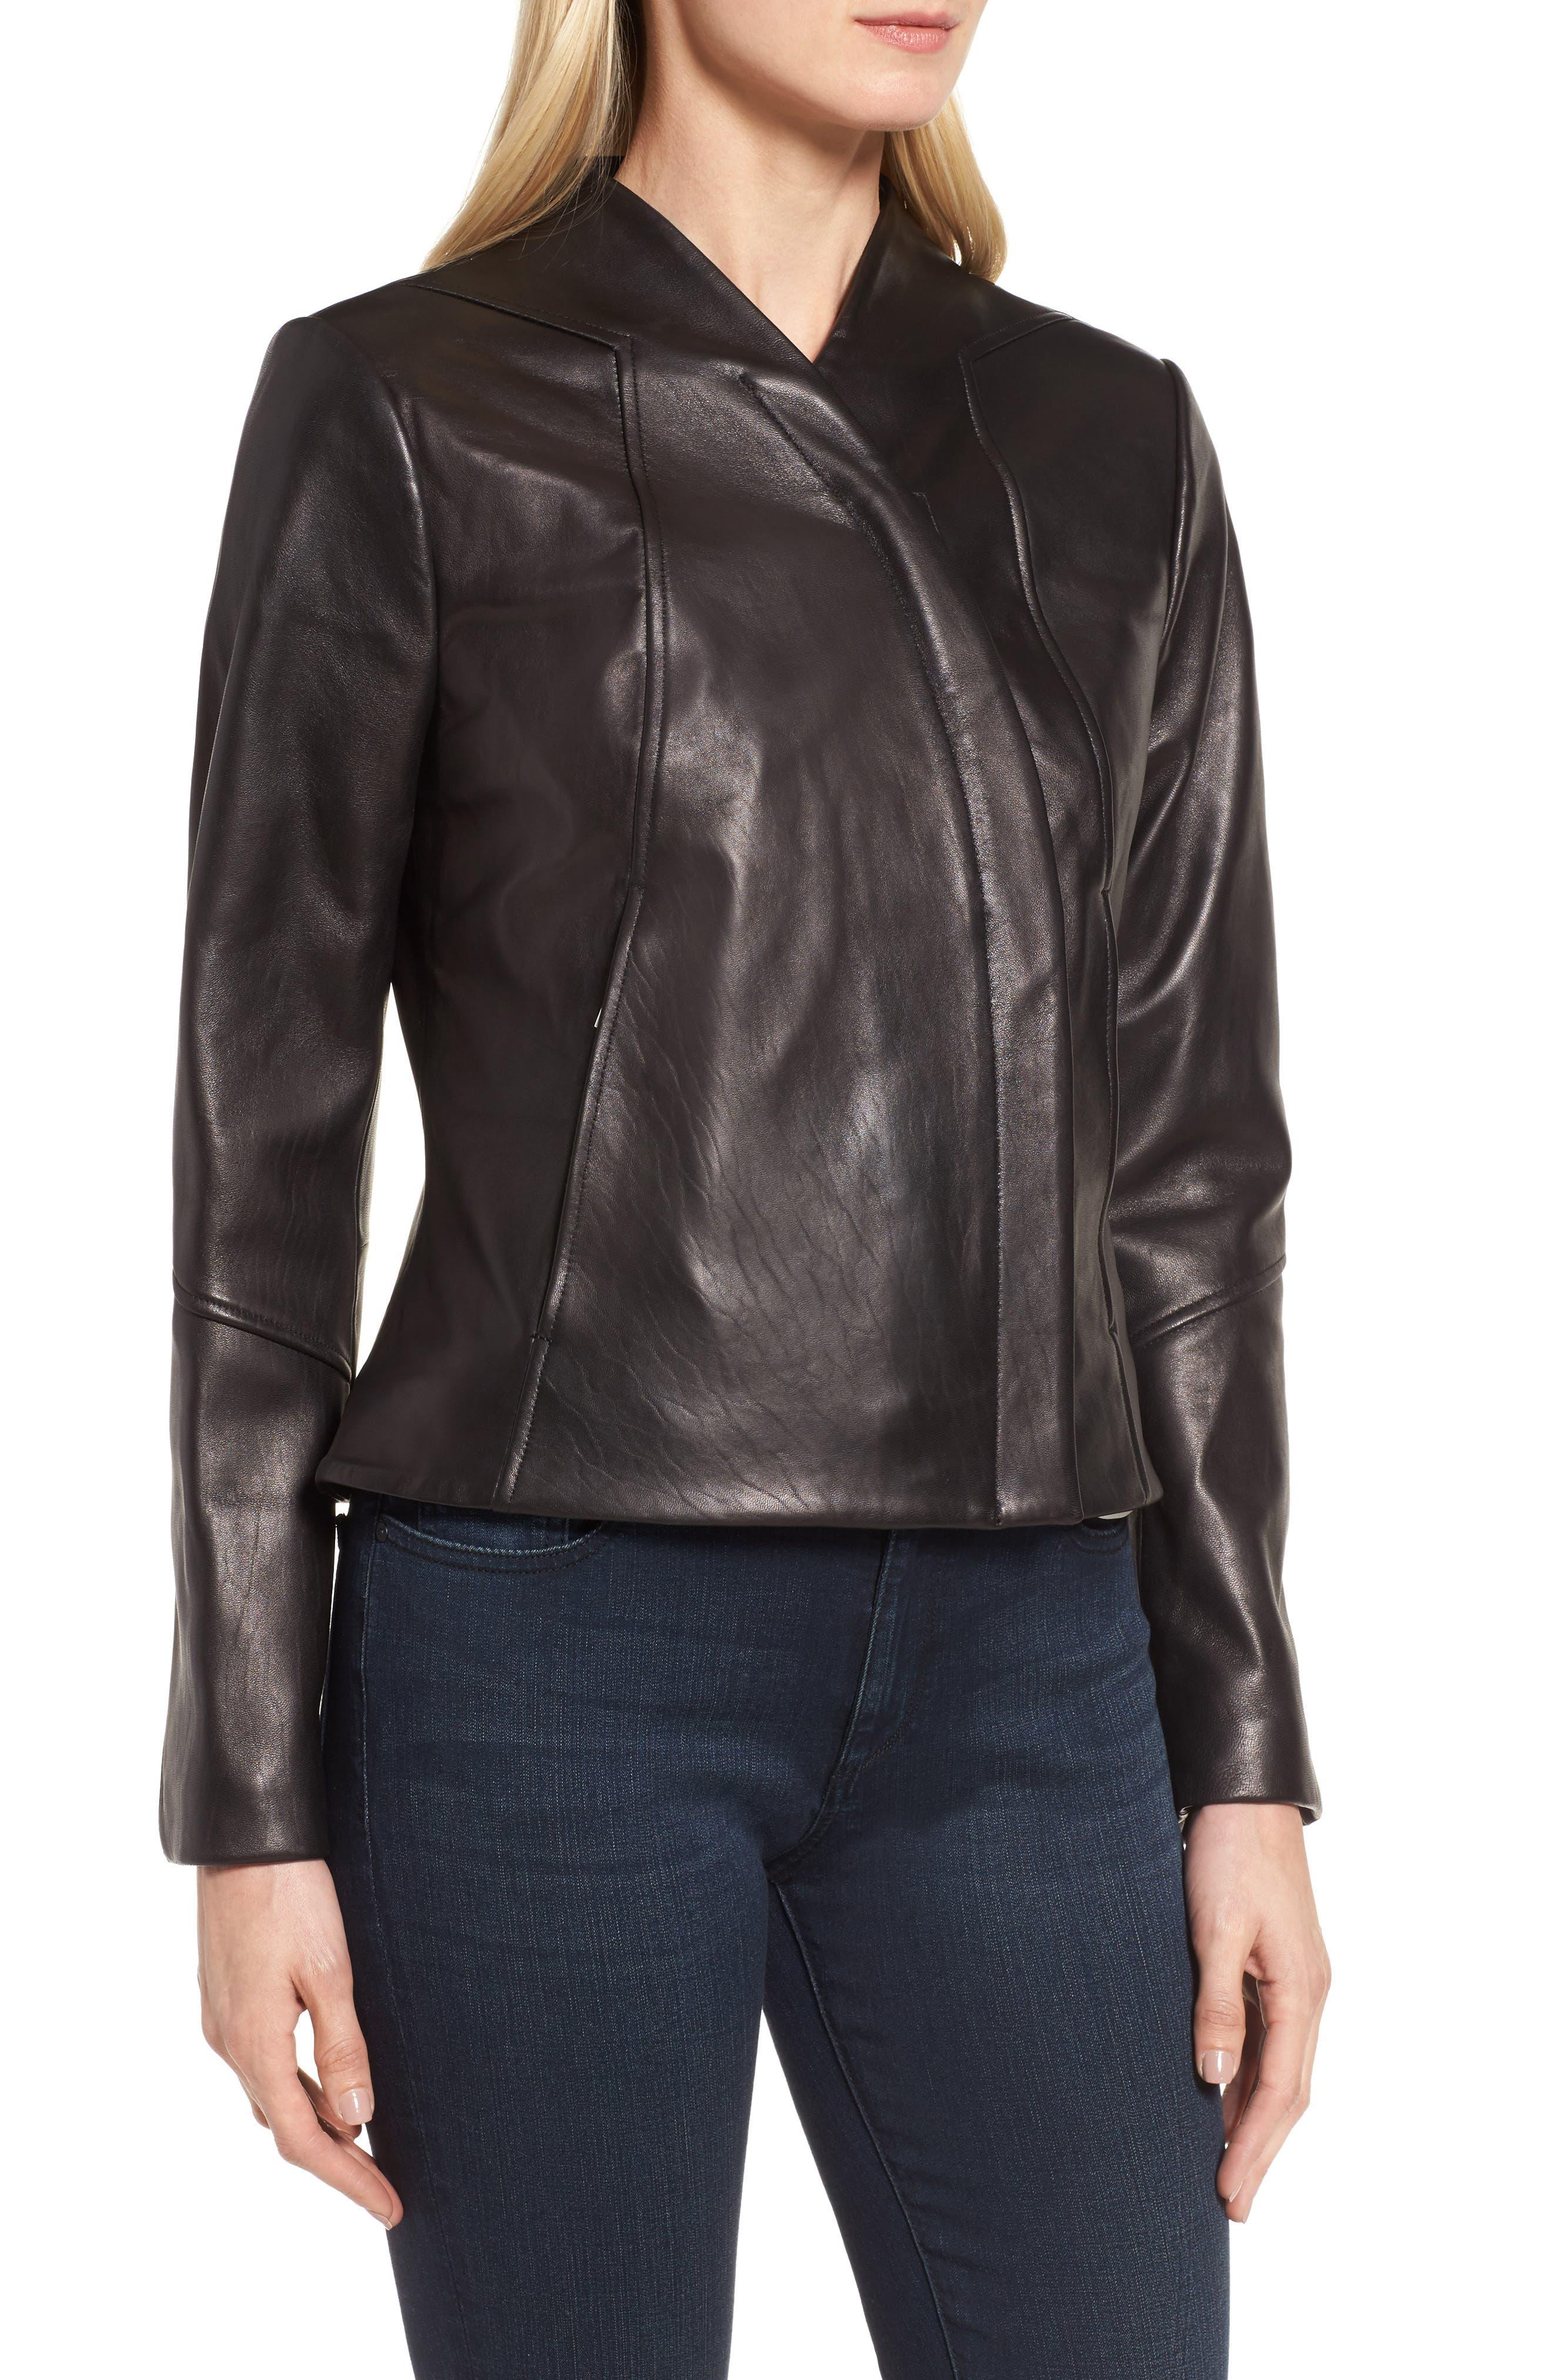 Seam Leather Jacket,                             Alternate thumbnail 4, color,                             Black